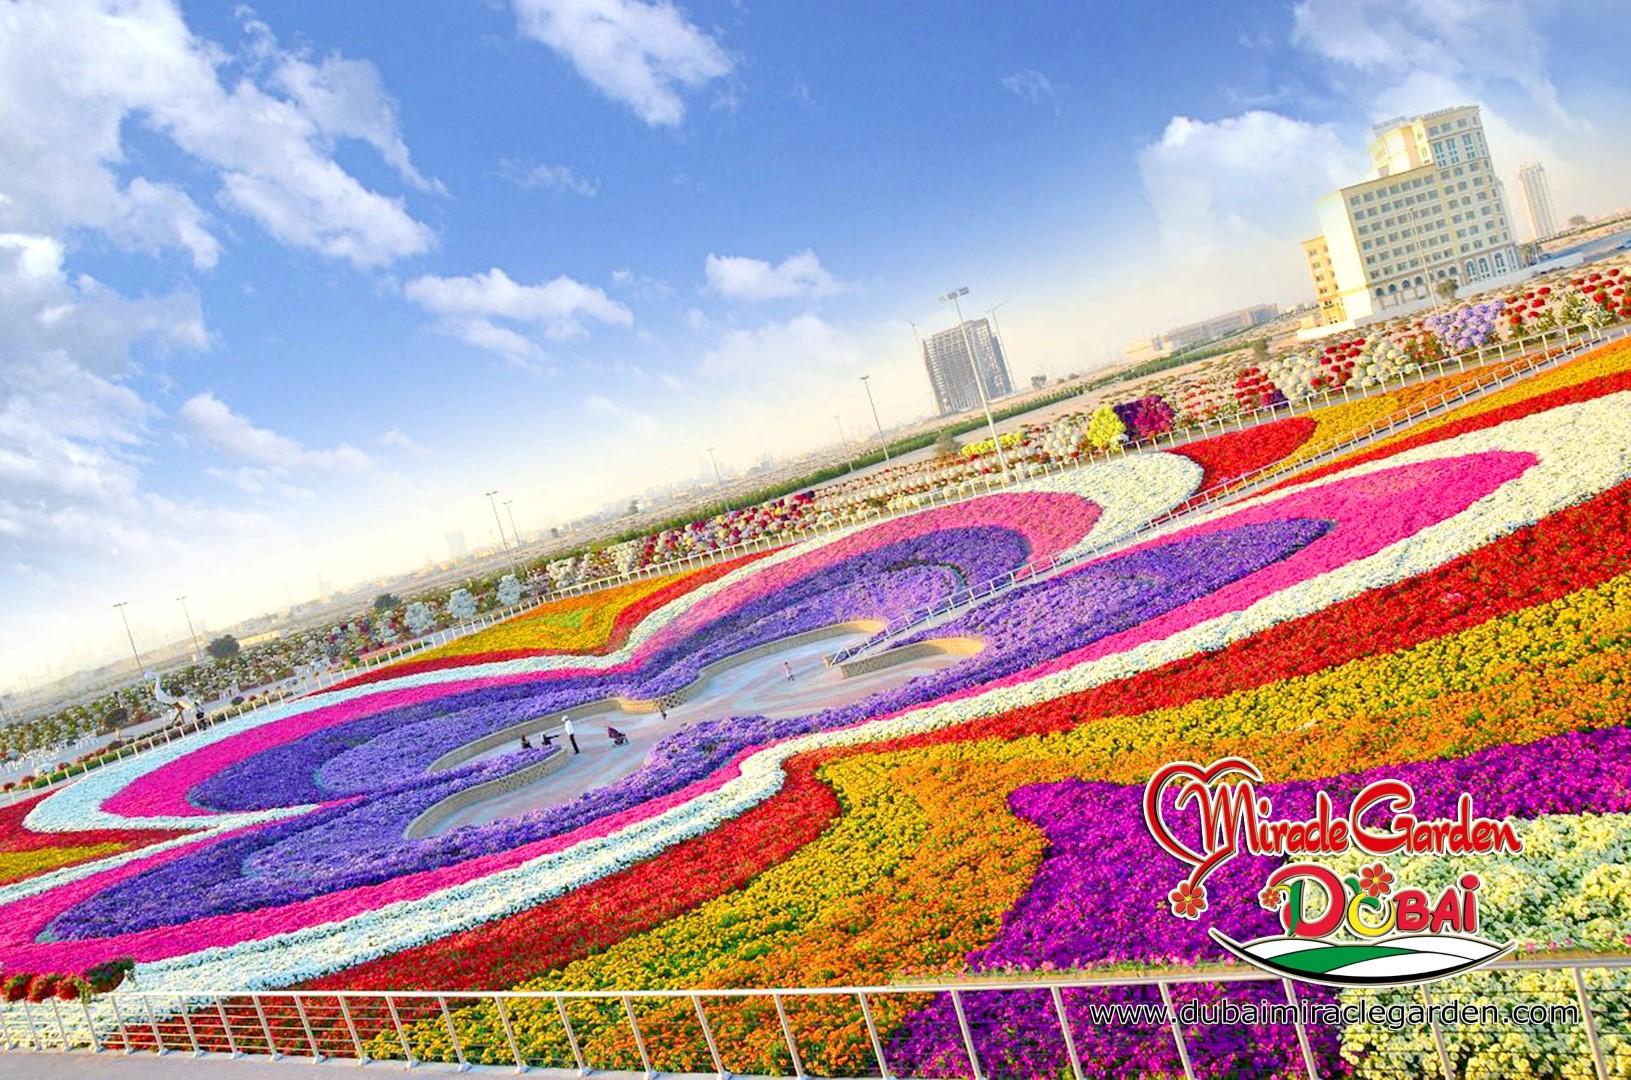 Dubai Miracle Garden The World S Biggest Natural Flower